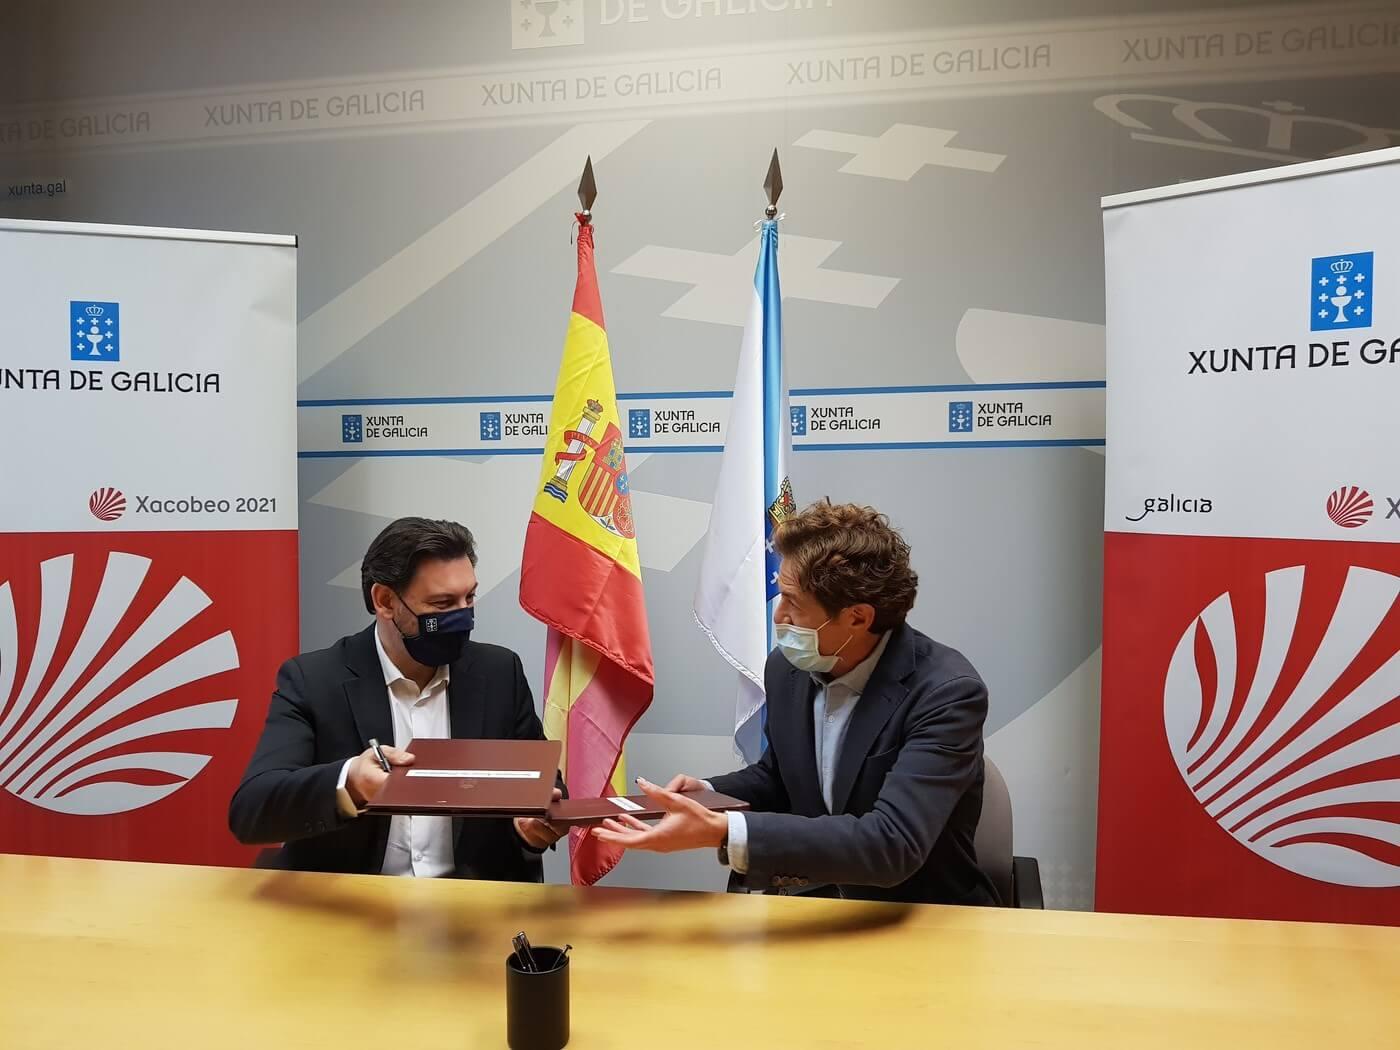 Programa MERLO mentoring experiencial para emprendedores migrantes